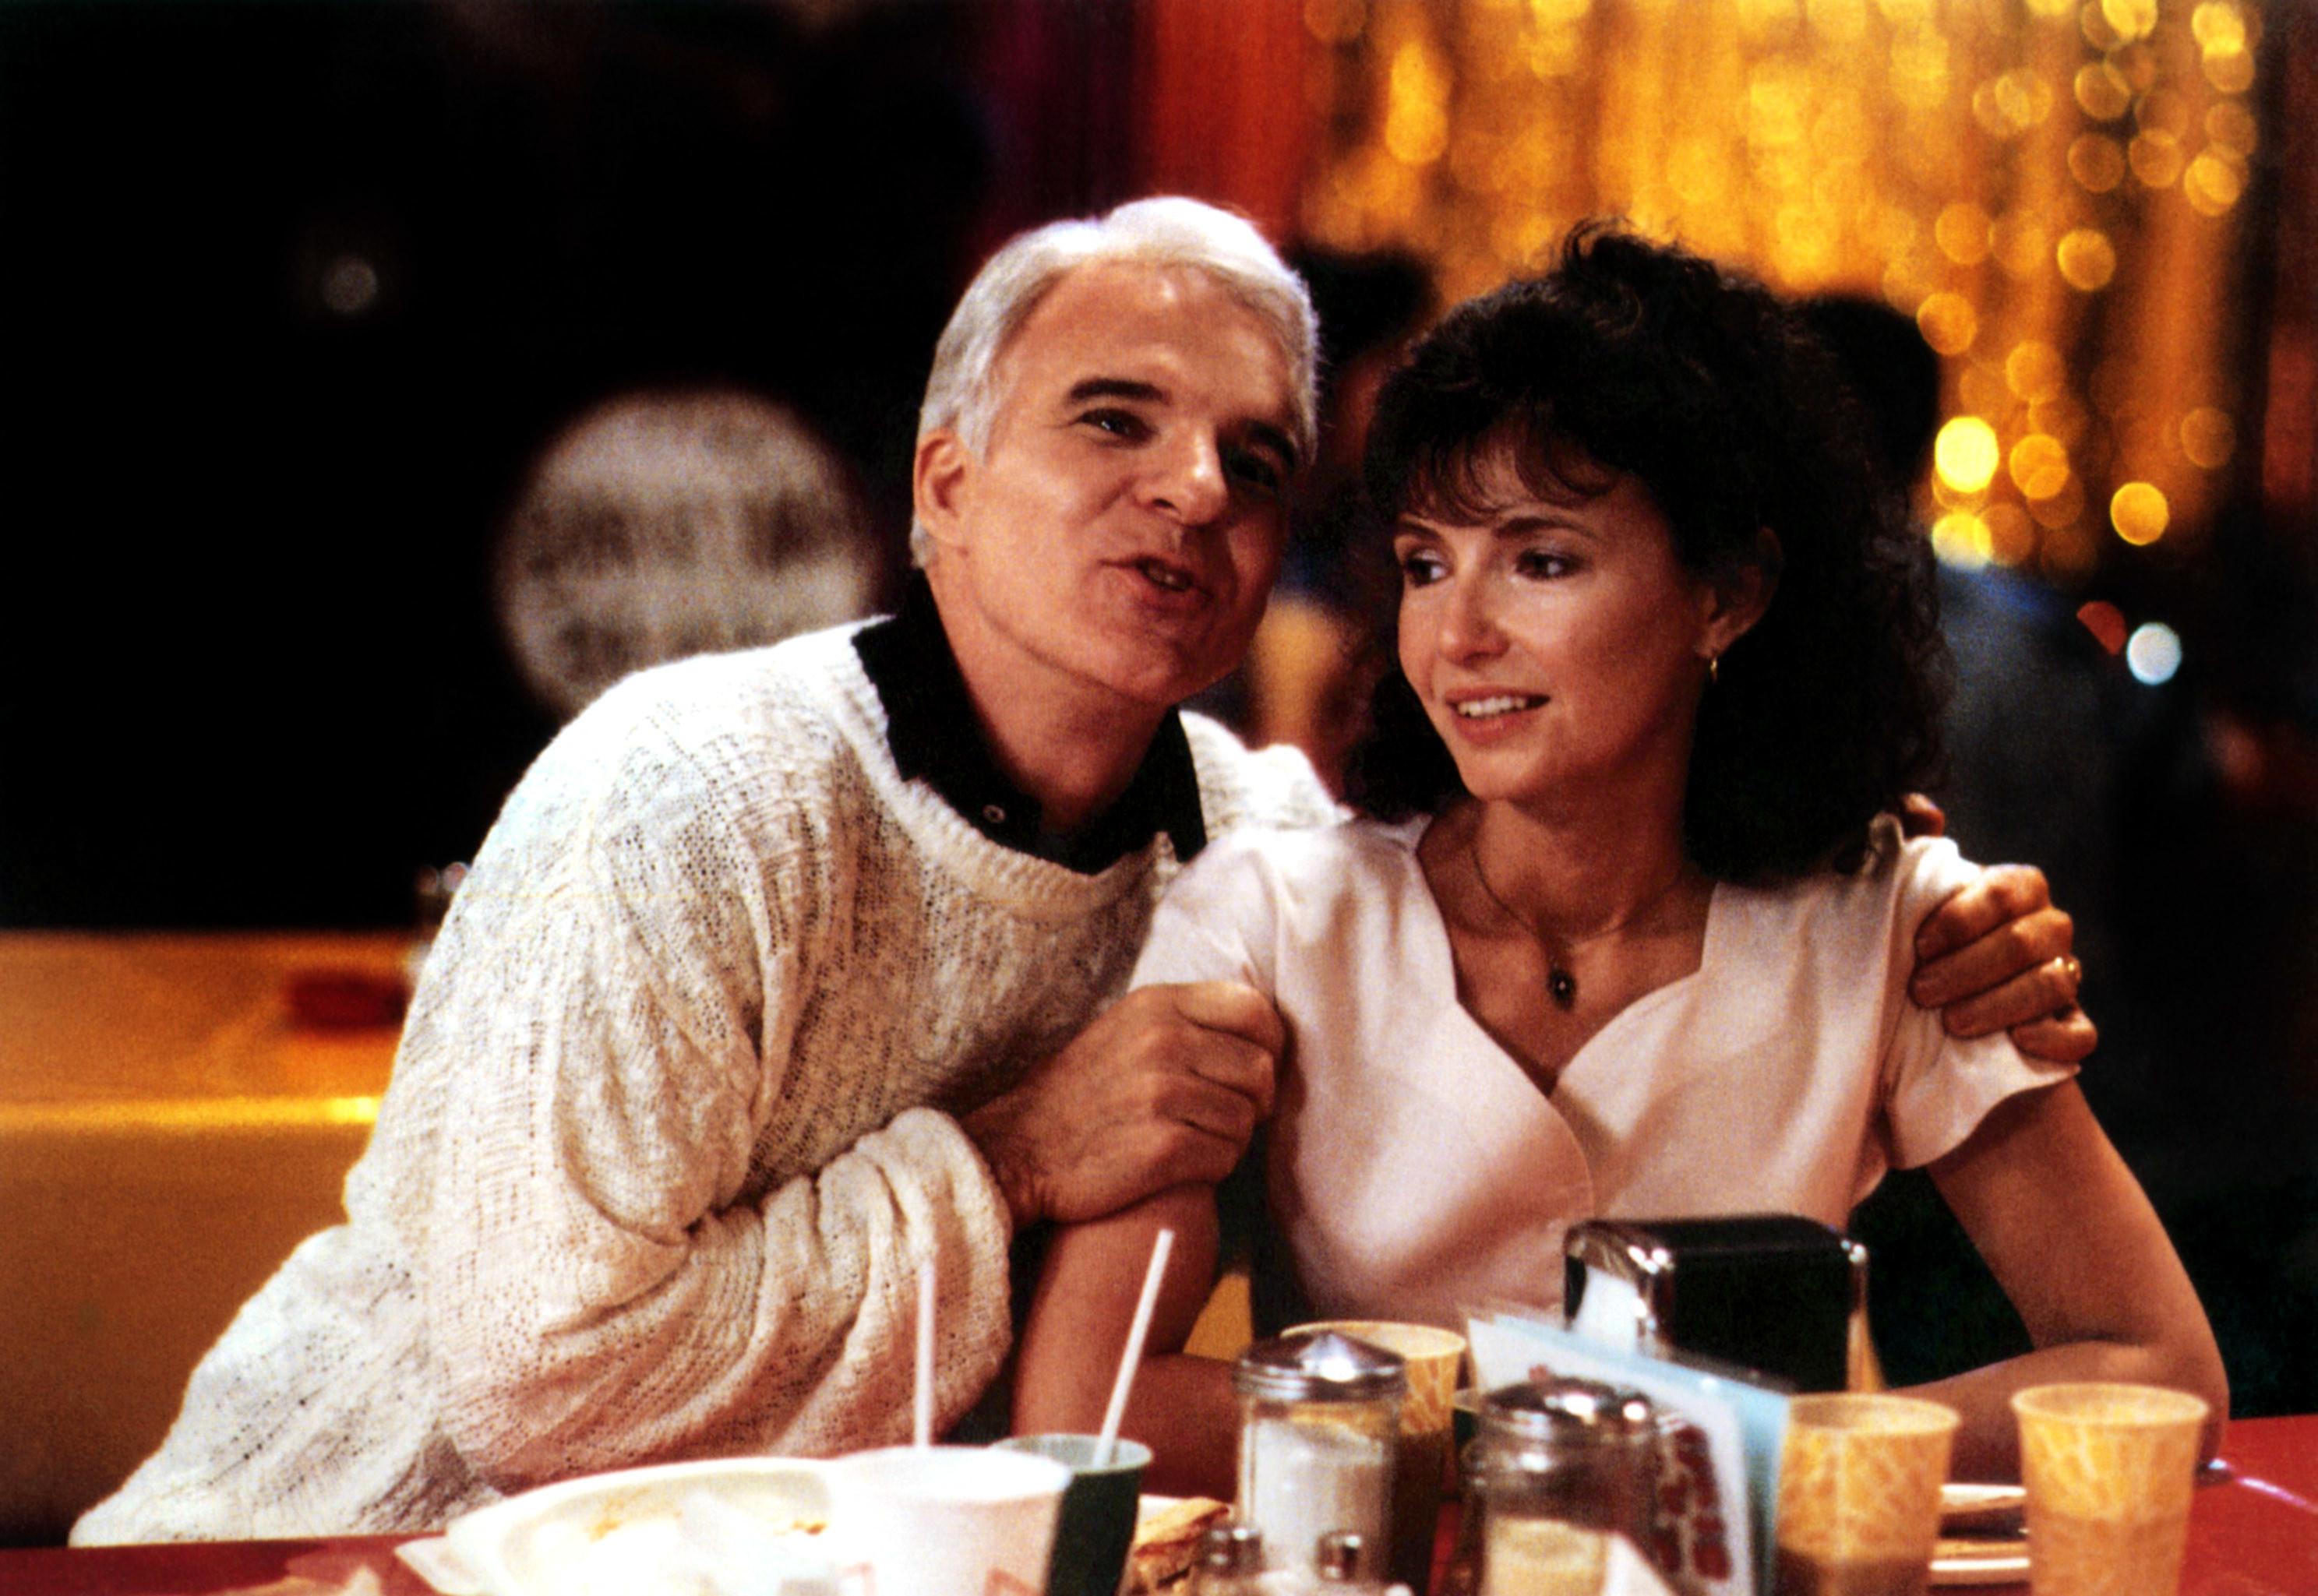 Steve Martin as Gil embracing Mary Steenburgen as Karen at a table at a restaraunt